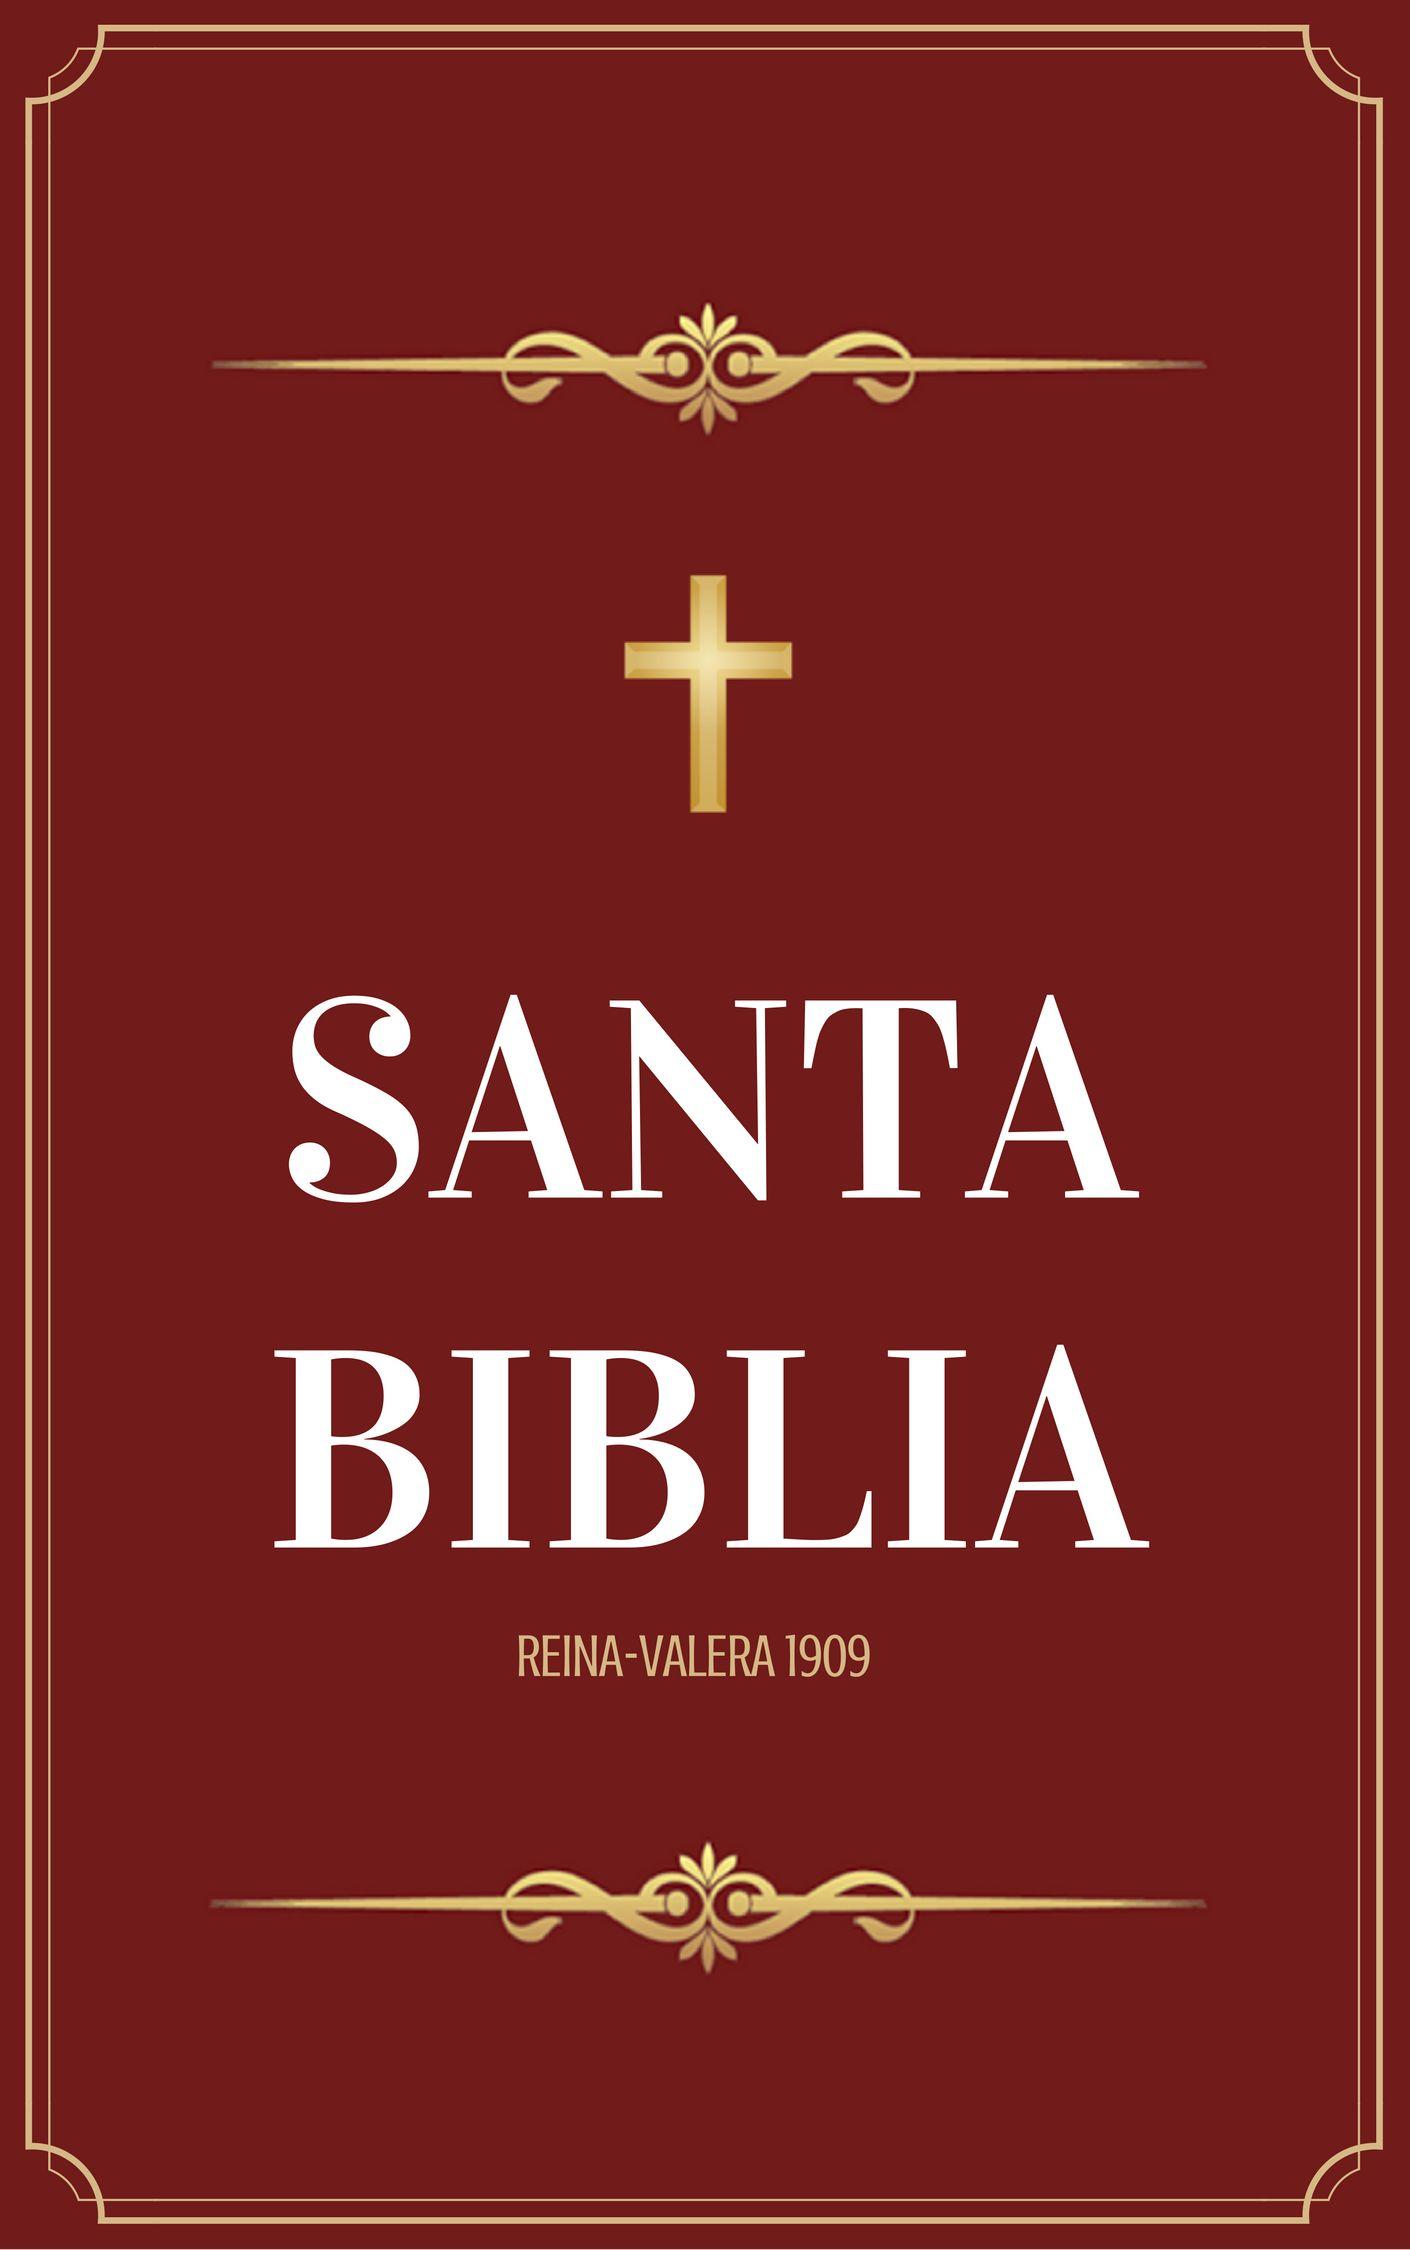 El Matrimonio La Biblia Reina Valera : Santa biblia reina valera payhip